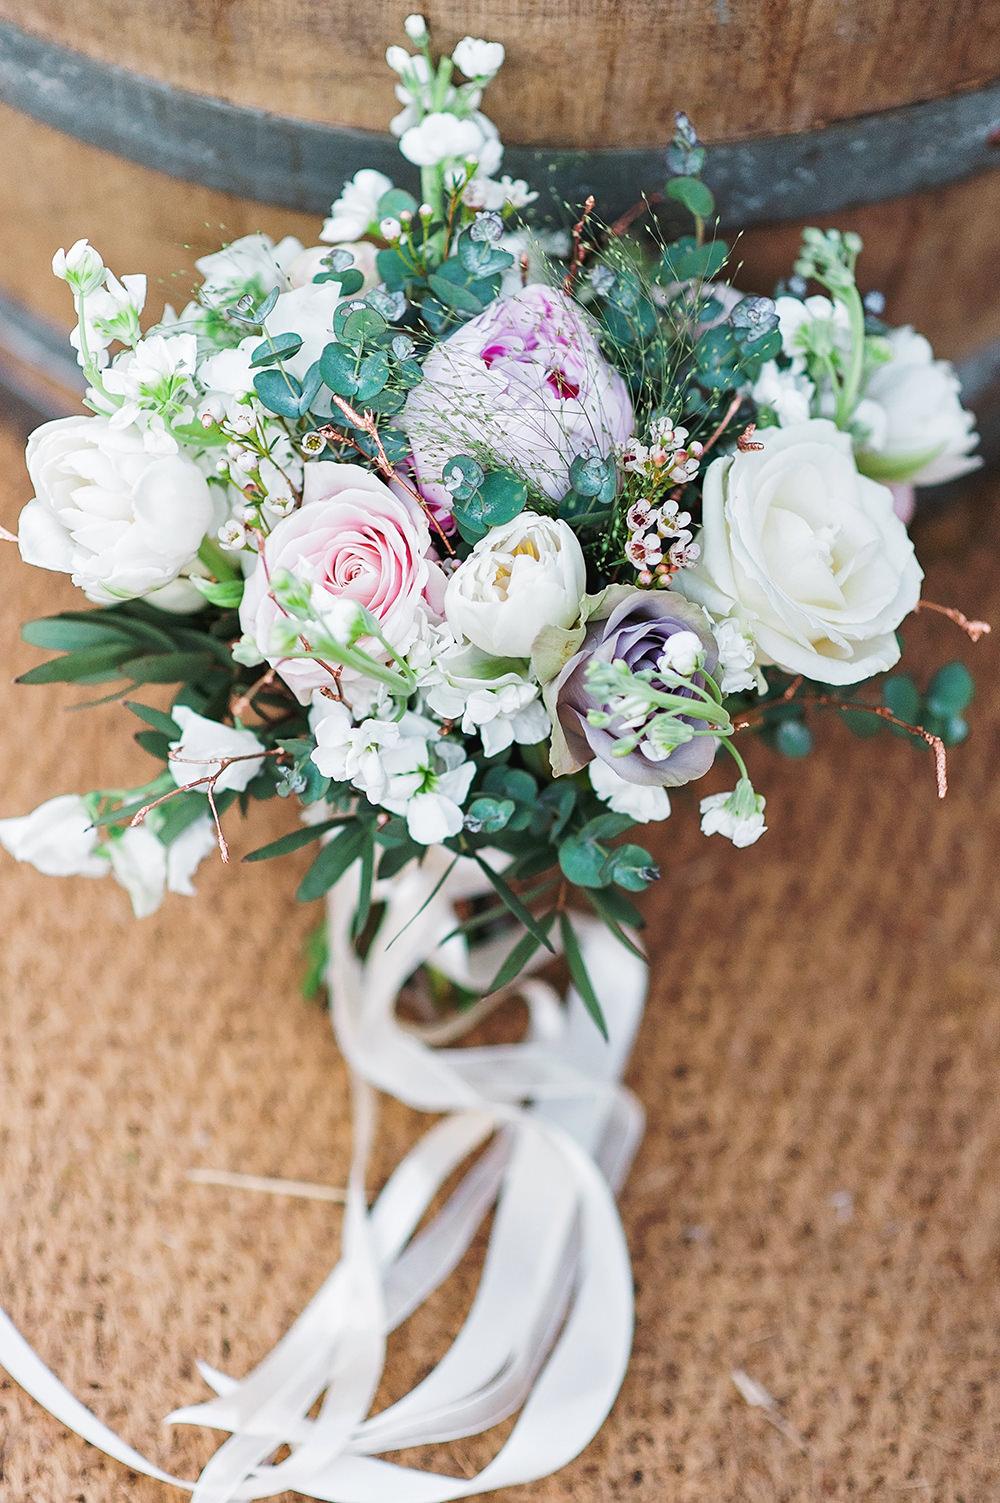 Bride Bridal Bouquet Peony Rose Pink White Edmondsham House Wedding Darima Frampton Photography